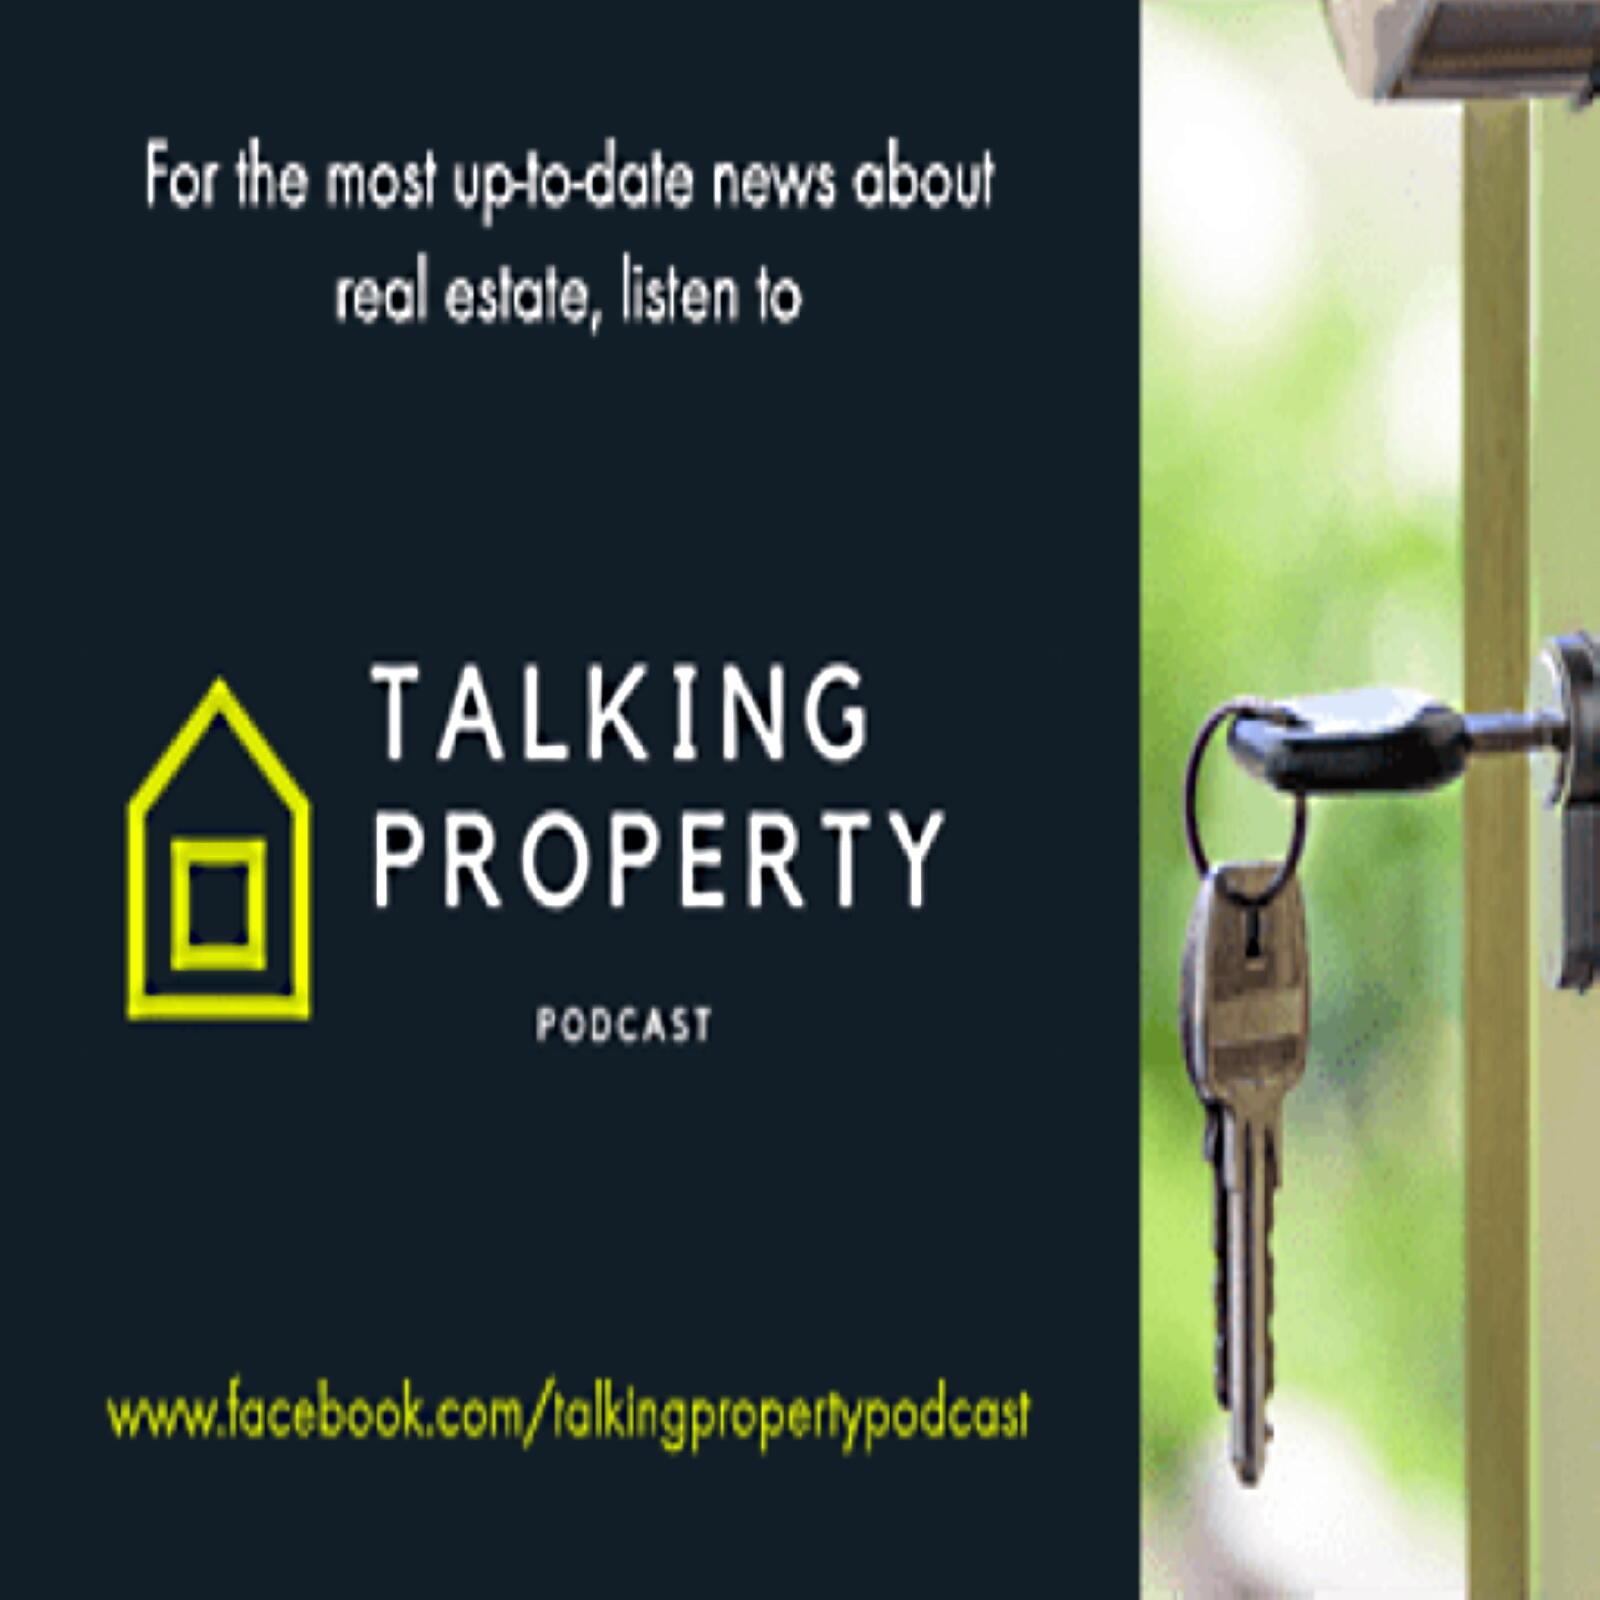 Talking Property